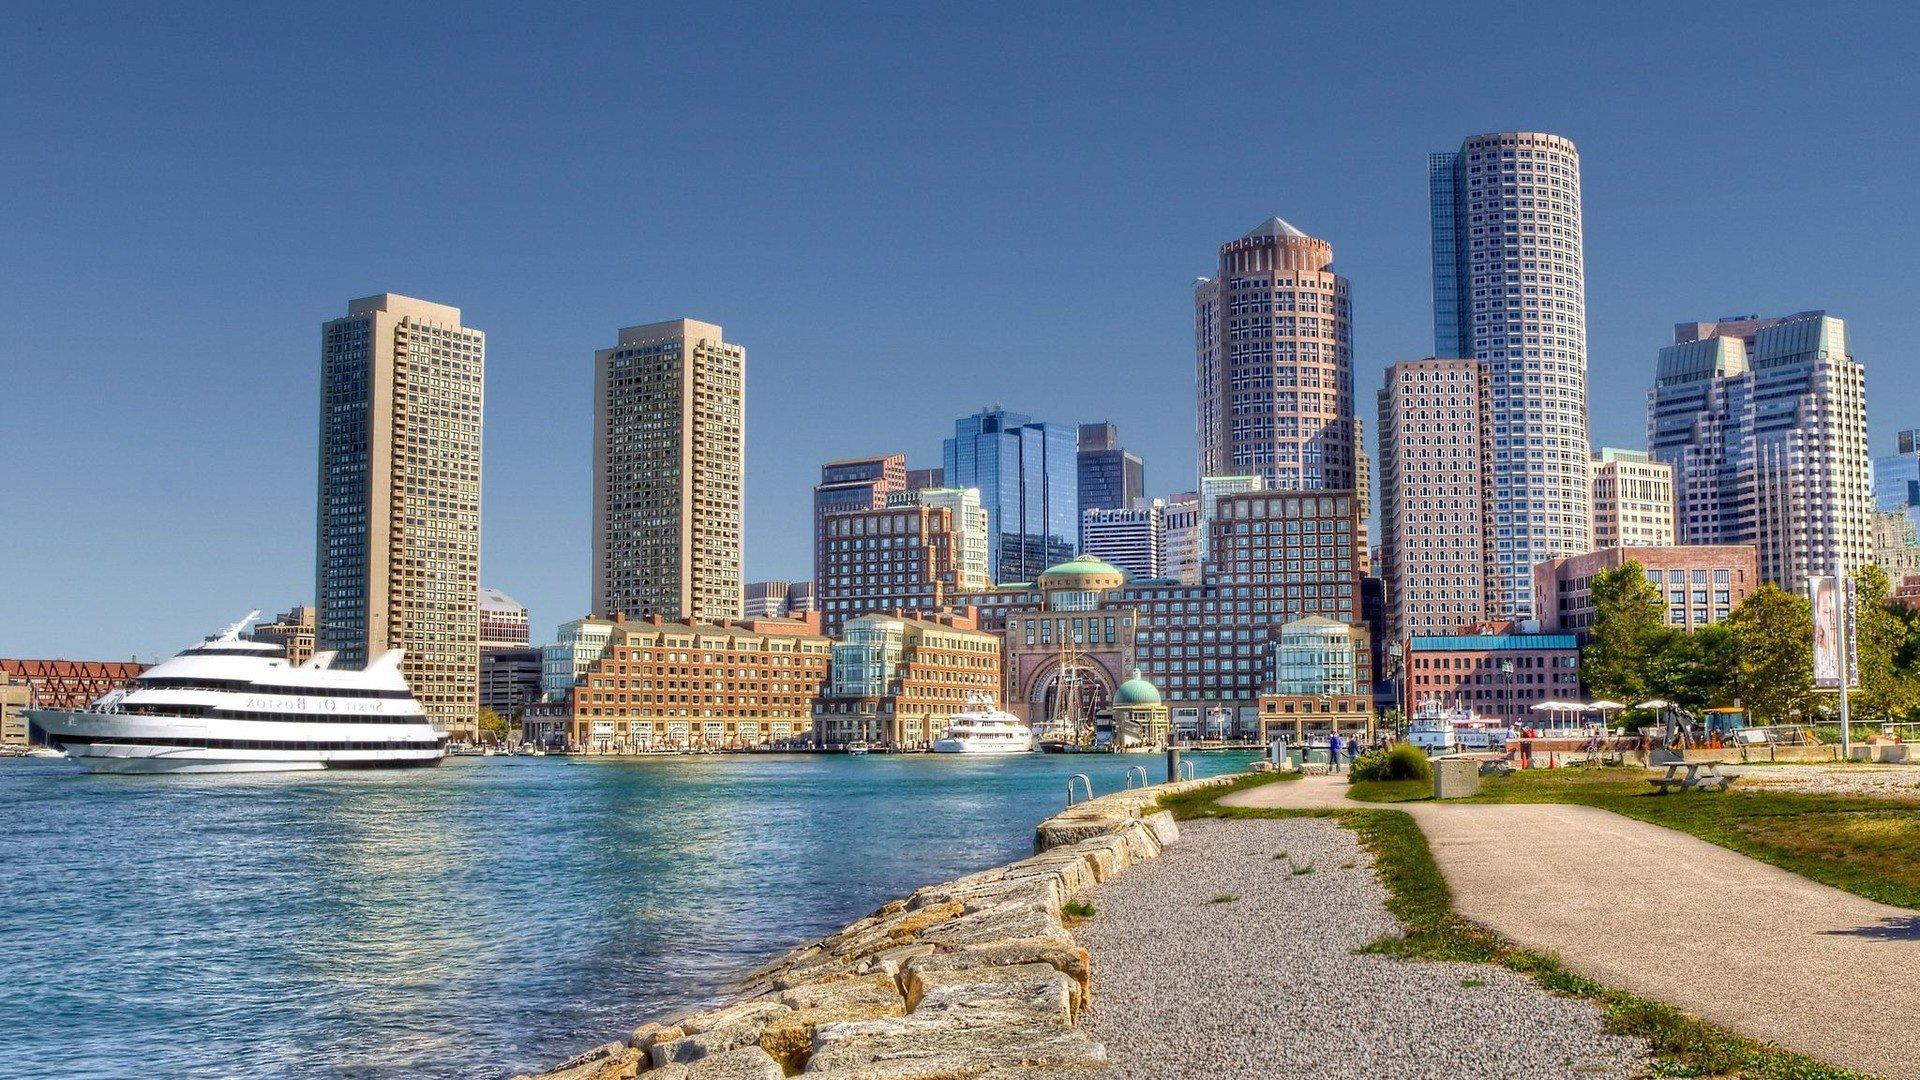 Boston HD Wallpaper | Background Image